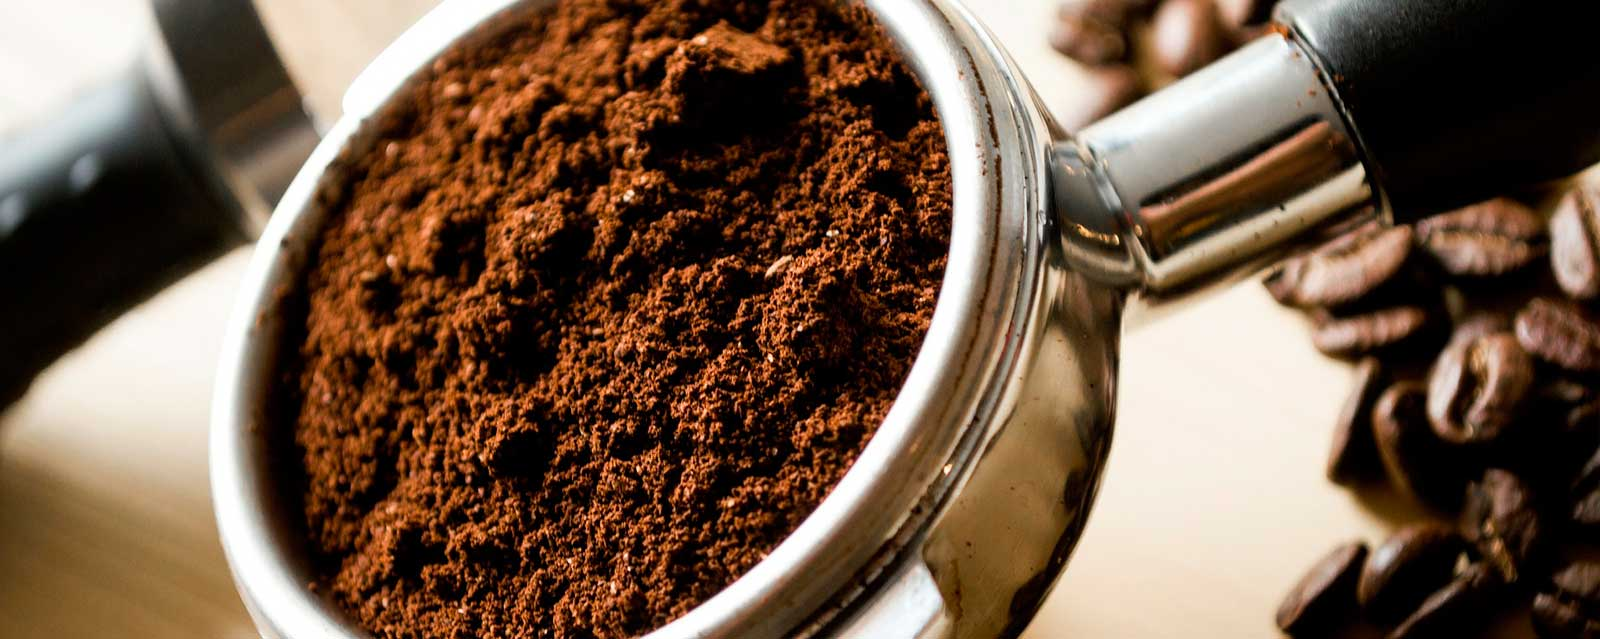 resistencia fisica con cafe